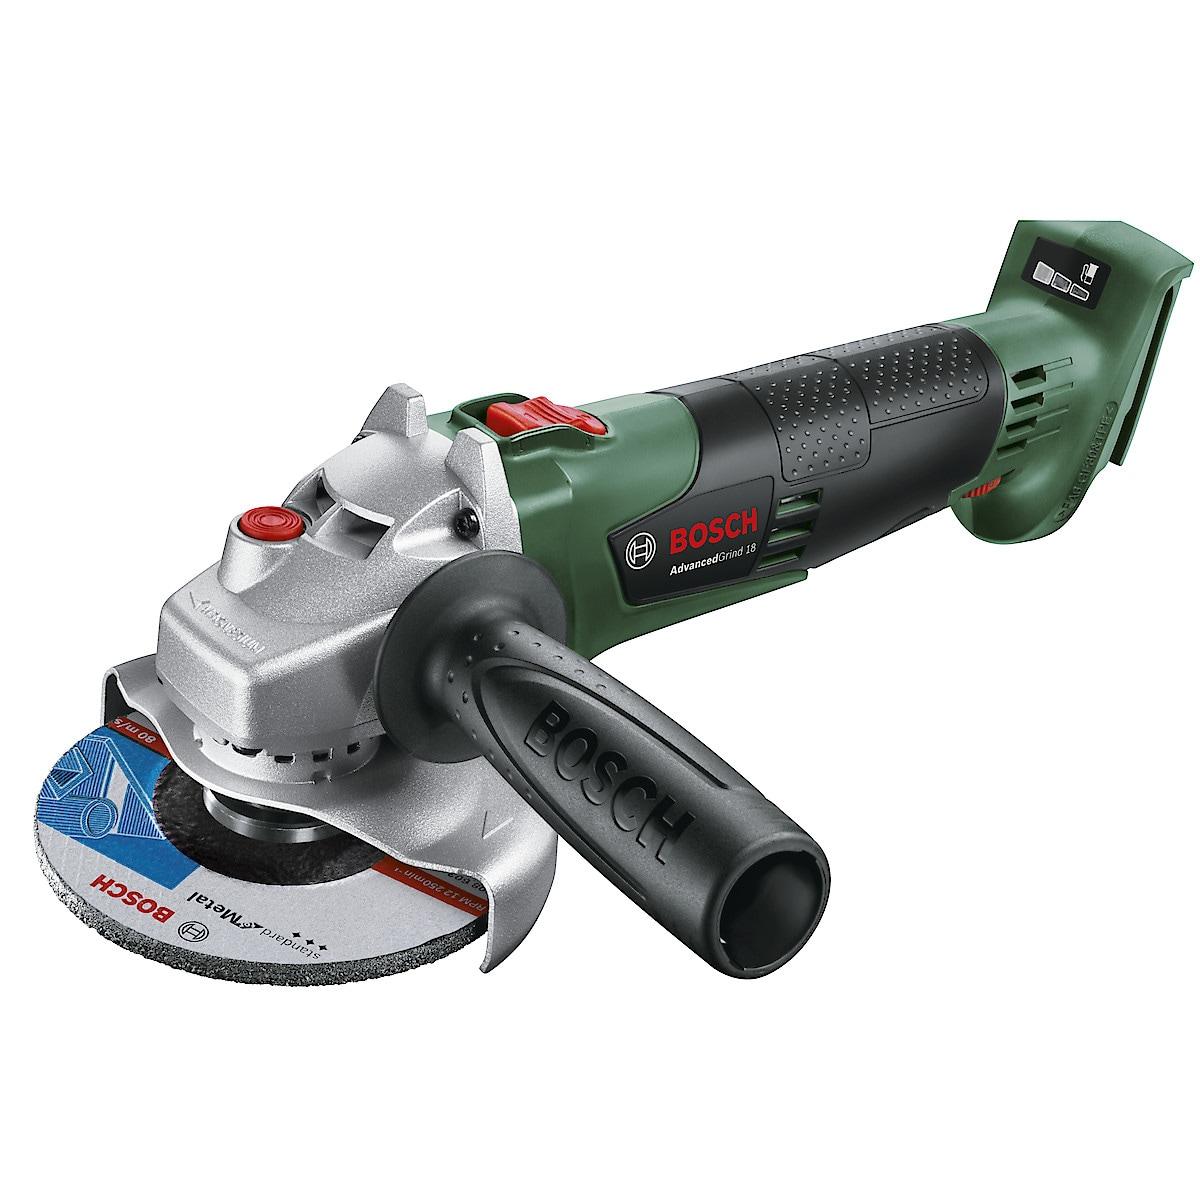 Vinkelslip Bosch AdvancedGrind 18